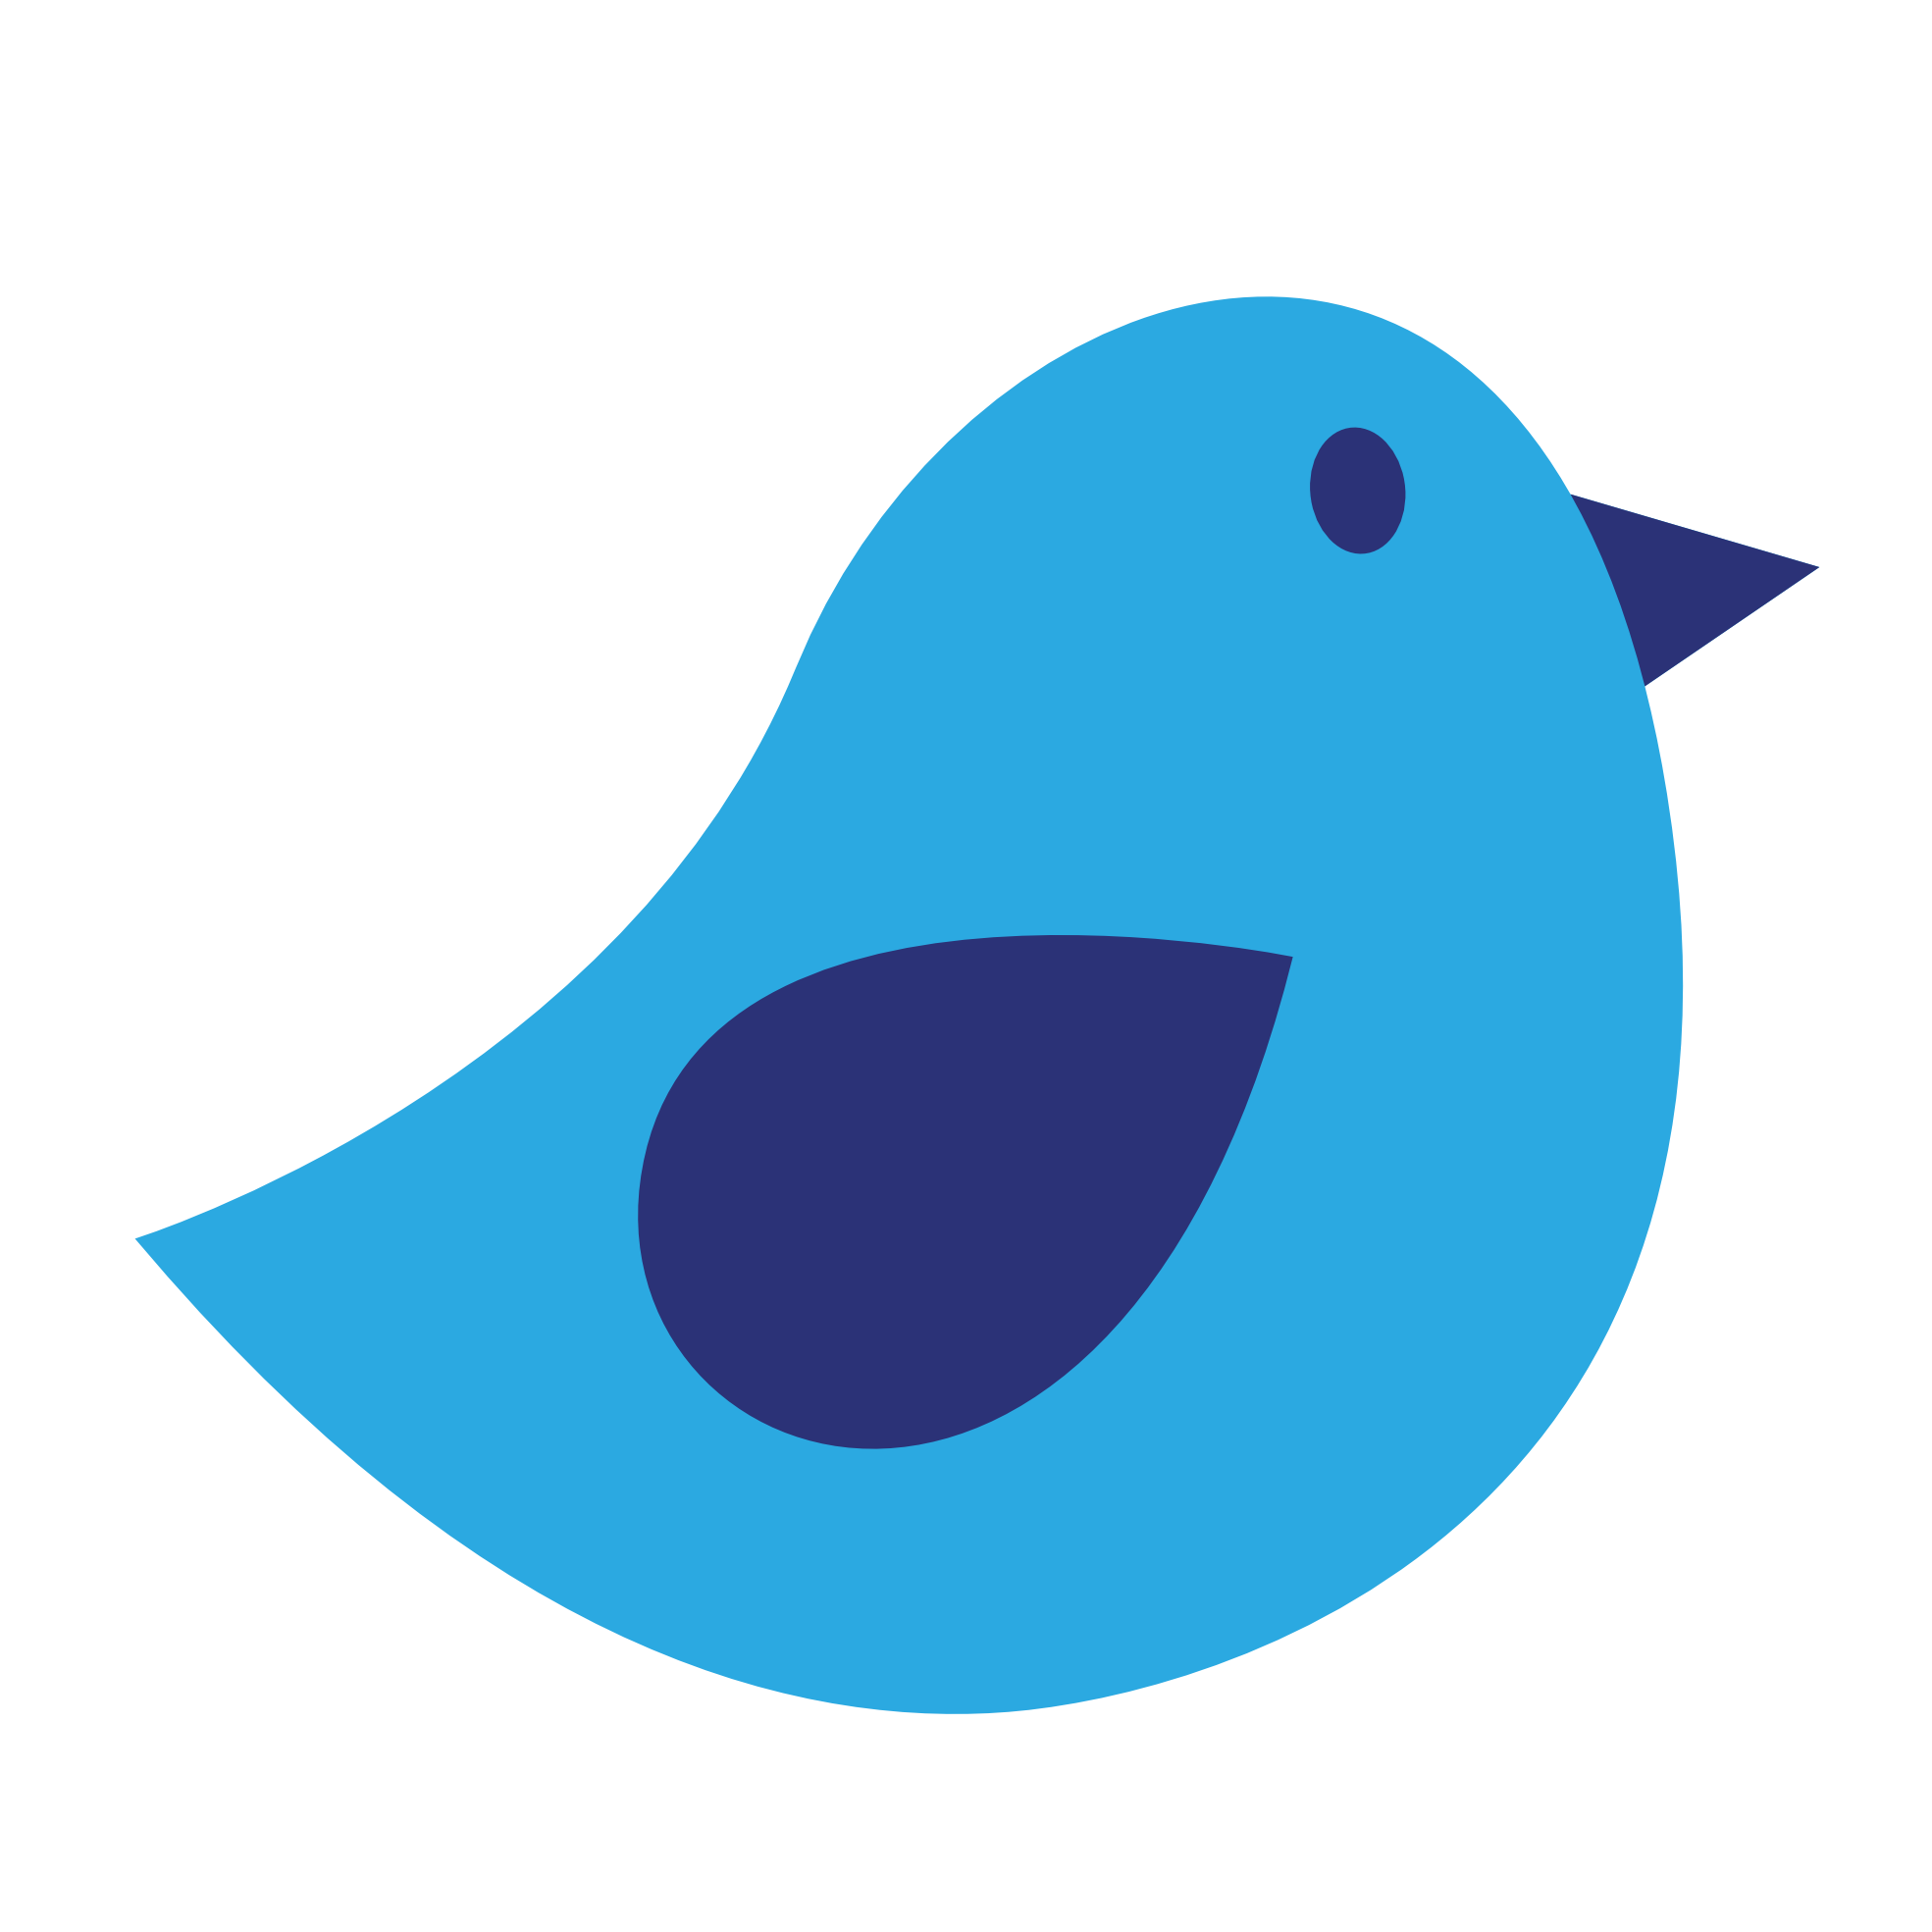 birds clipart simple